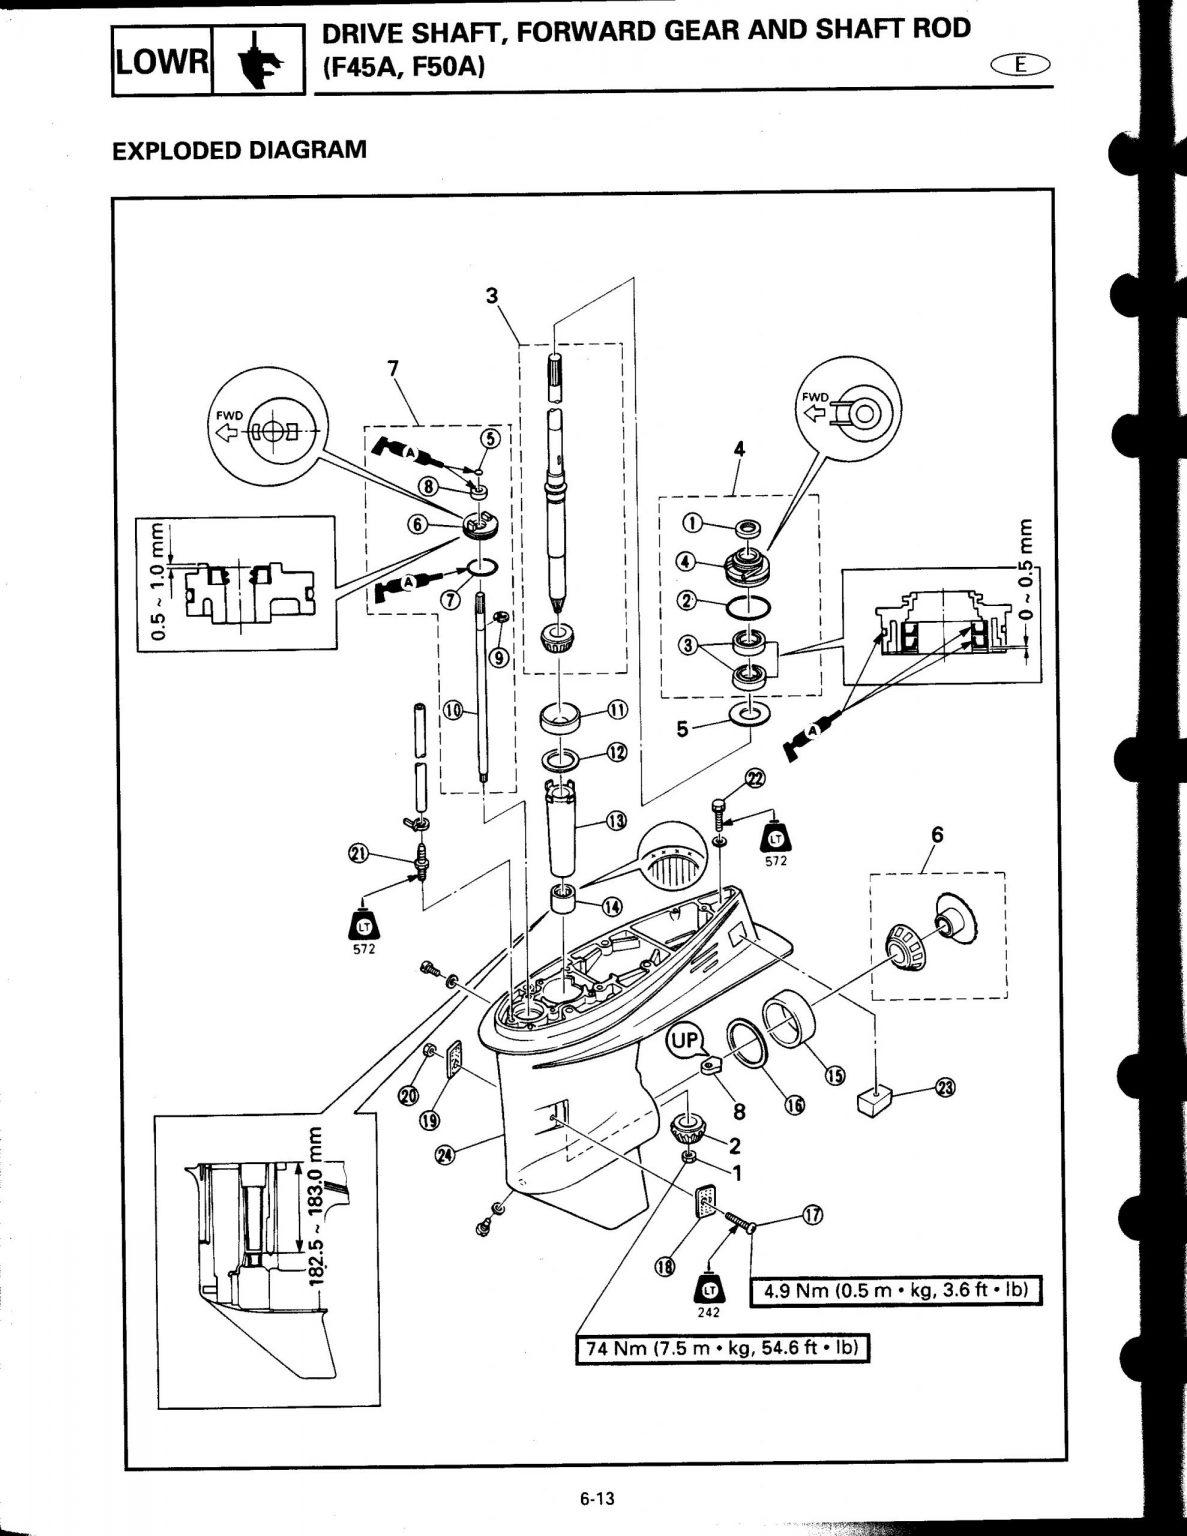 Used 1998 Yamaha Outboard Service Manual F50W & T50W LIT